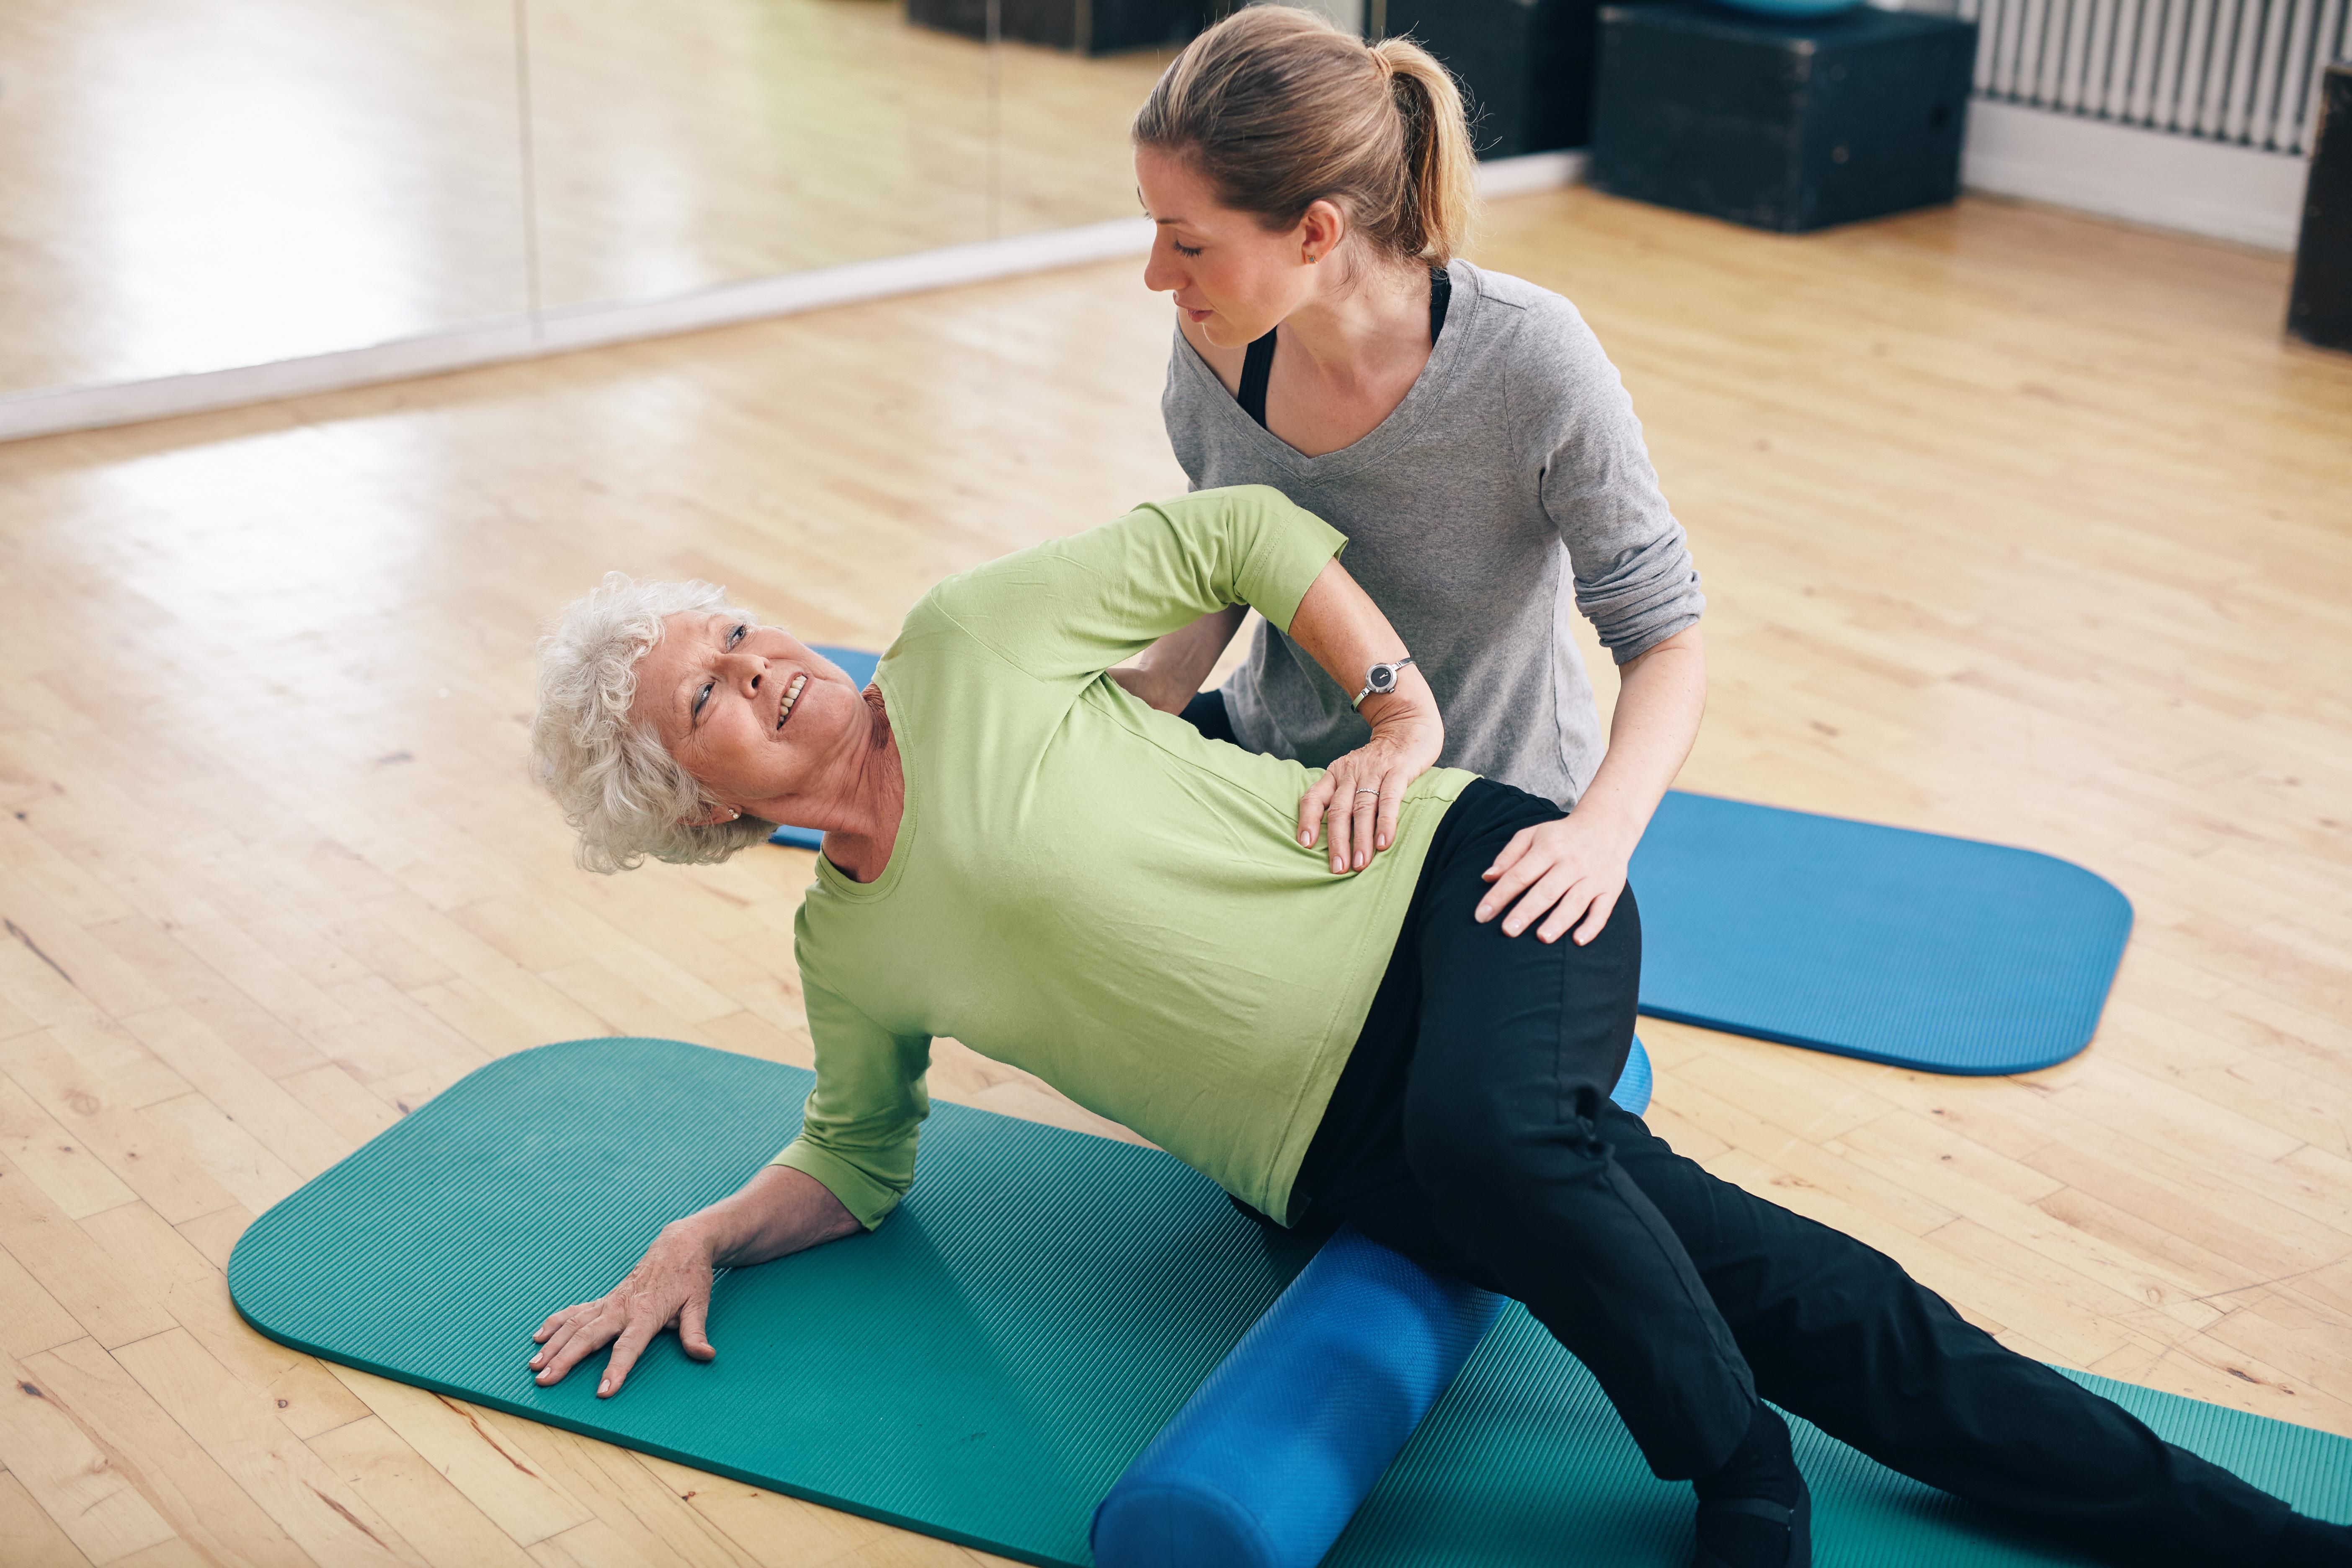 Stretcha med en skumrulle ger avslappnade muskler.